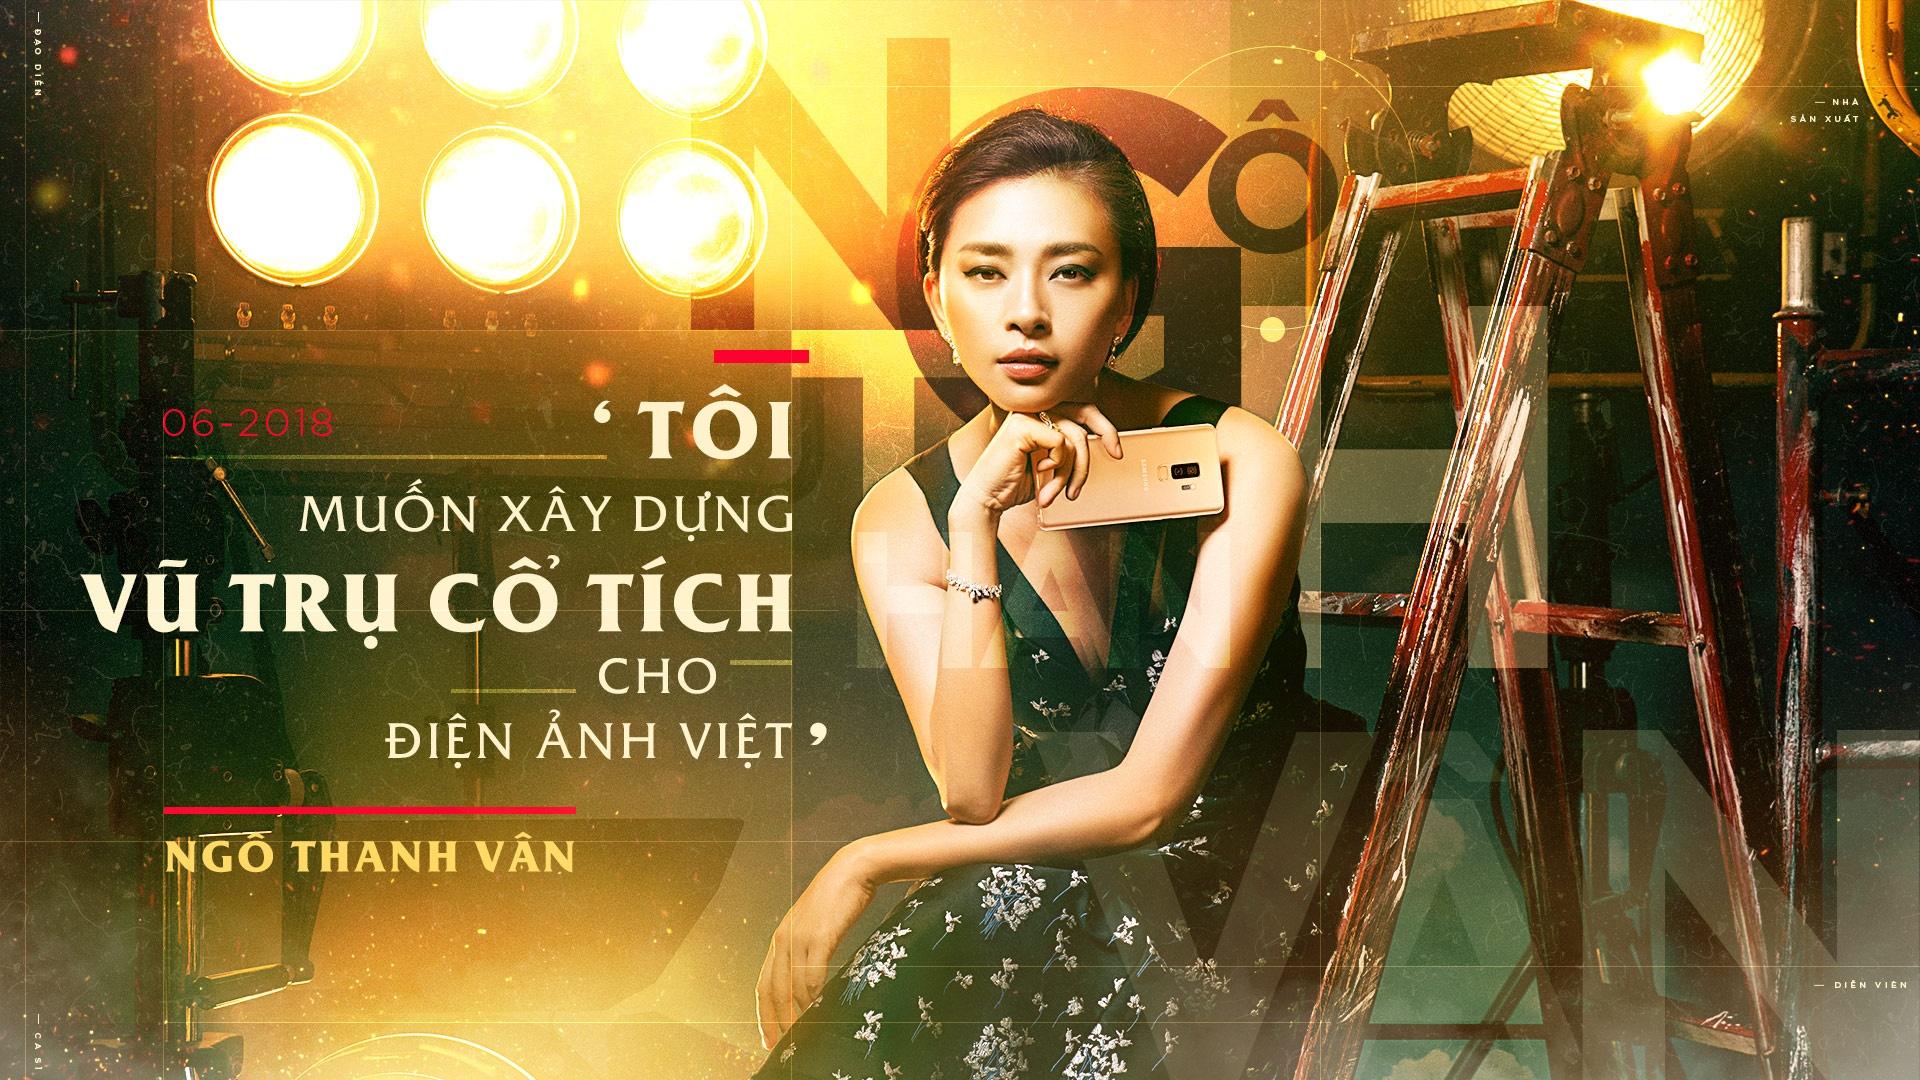 Ngo Thanh Van: 'Toi muon xay dung vu tru co tich cho dien anh Viet' hinh anh 2